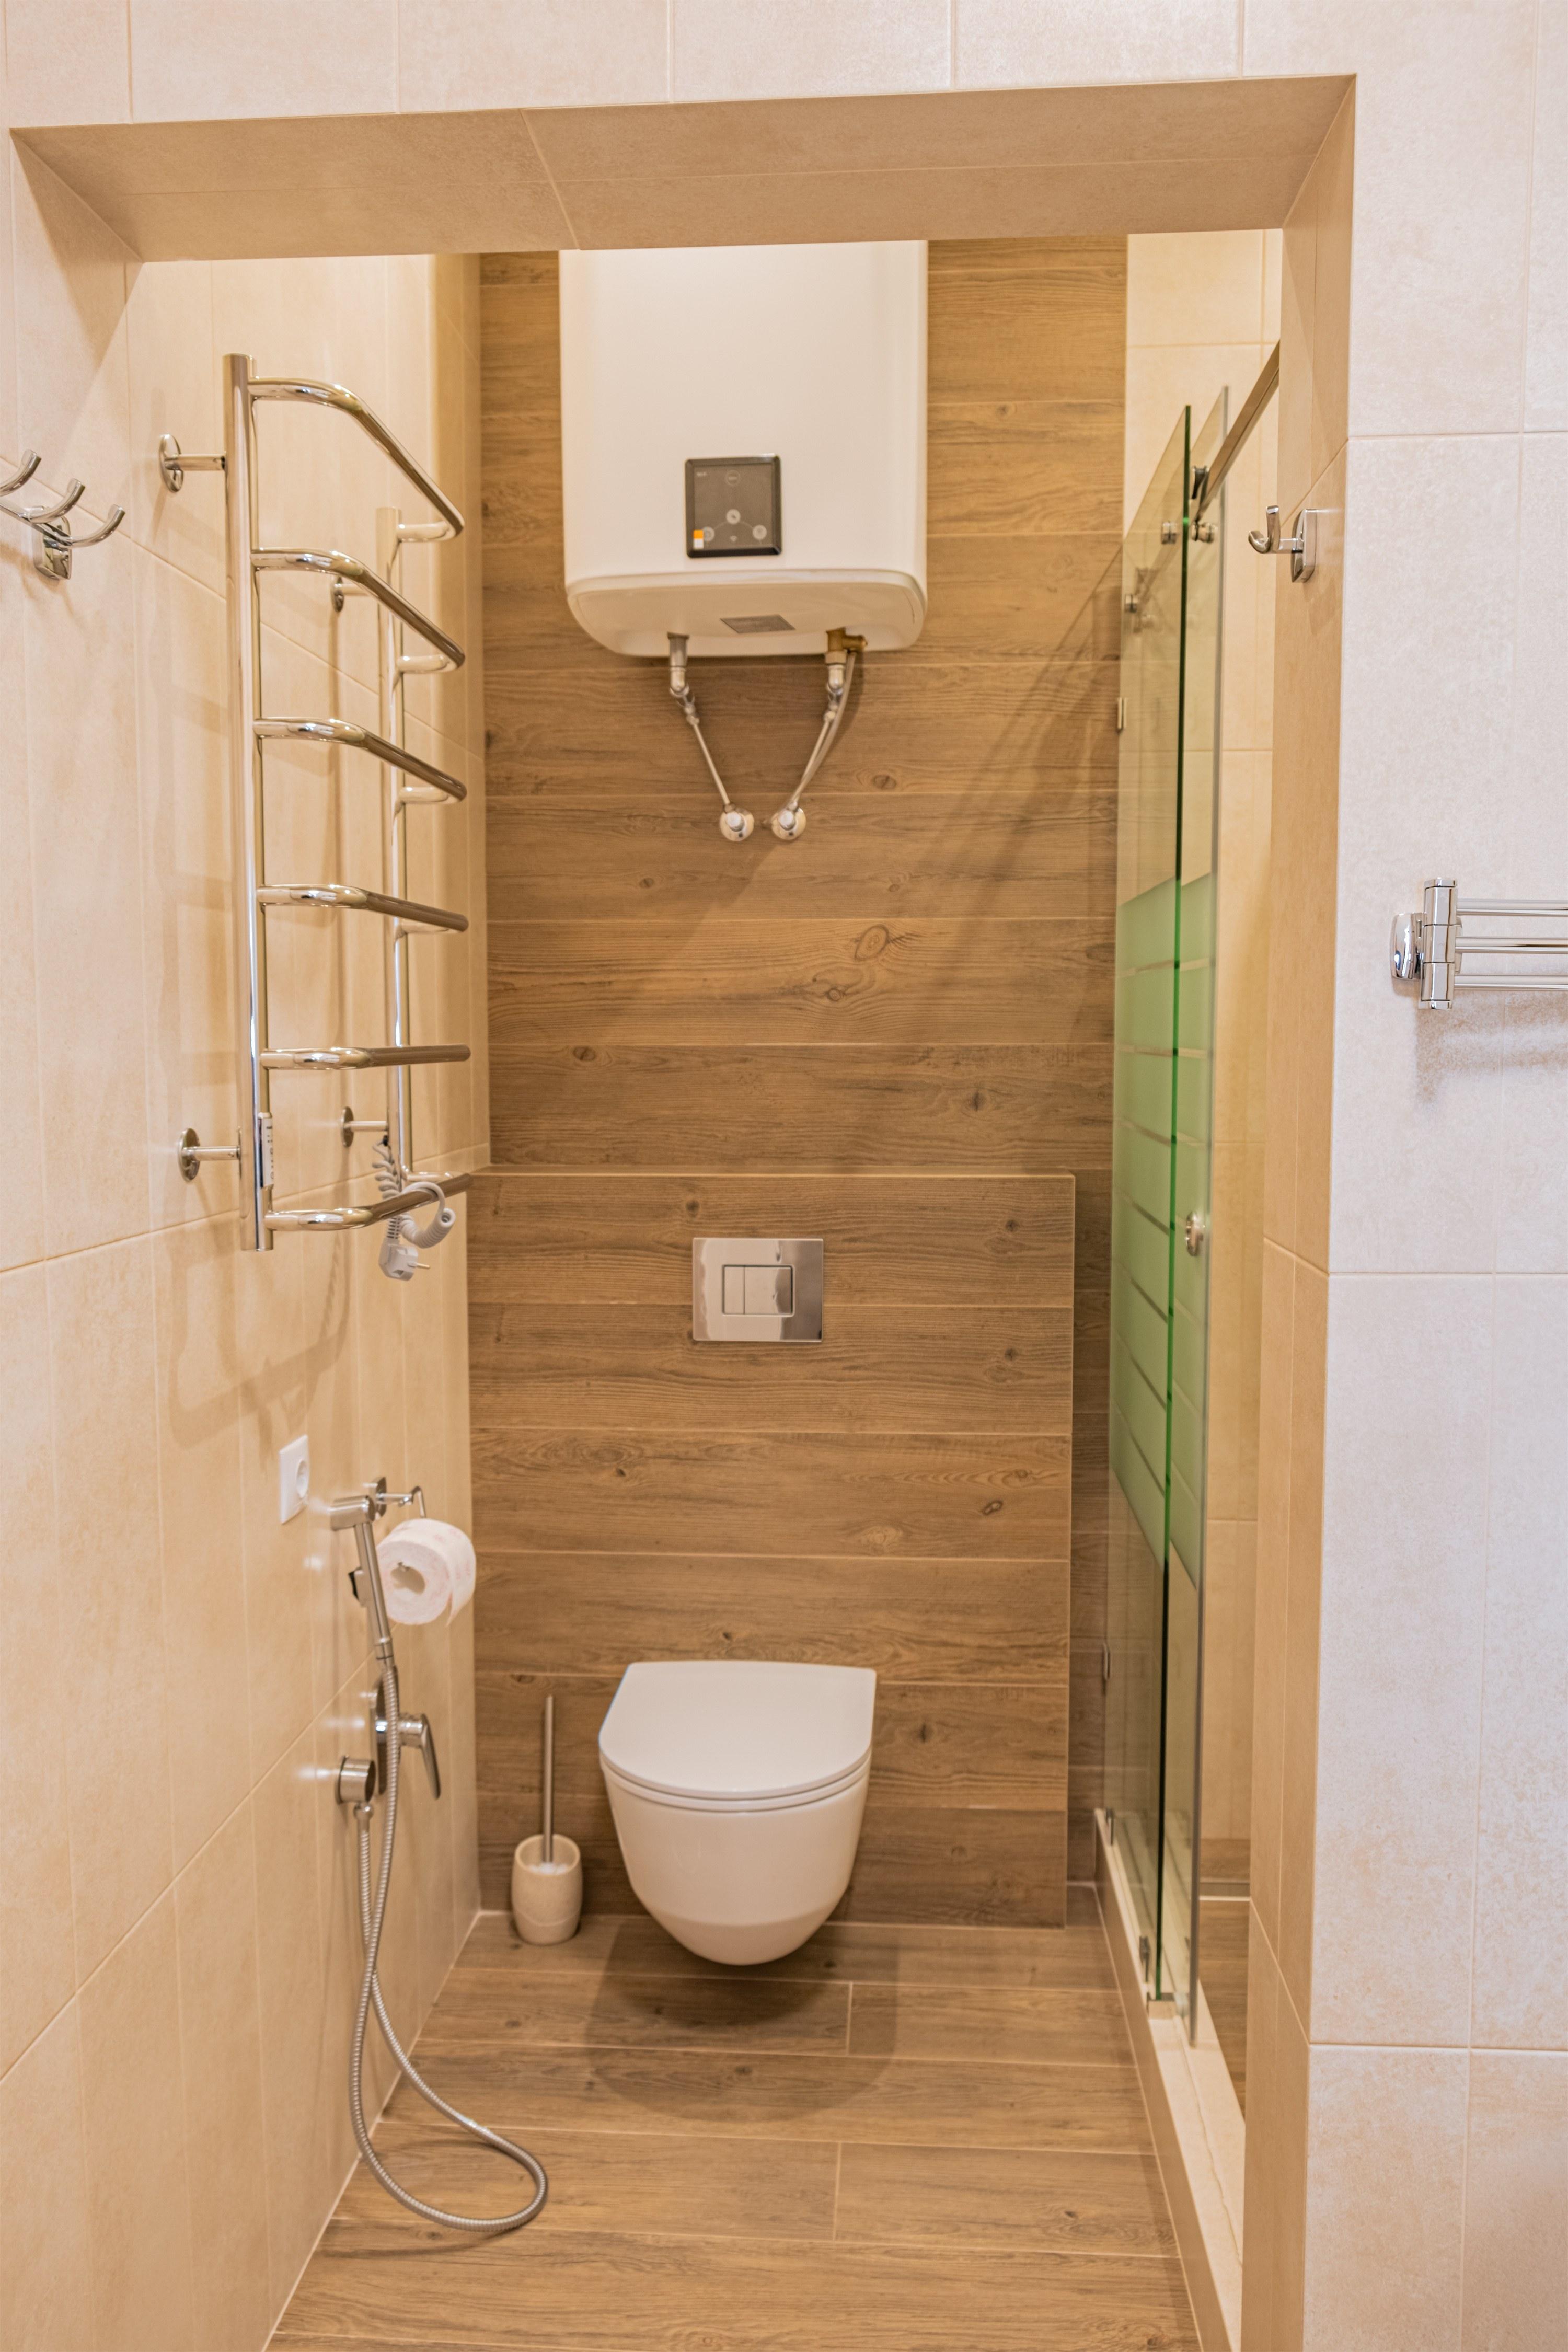 Ремонт туалета в ЖК Гагаринский Стикон